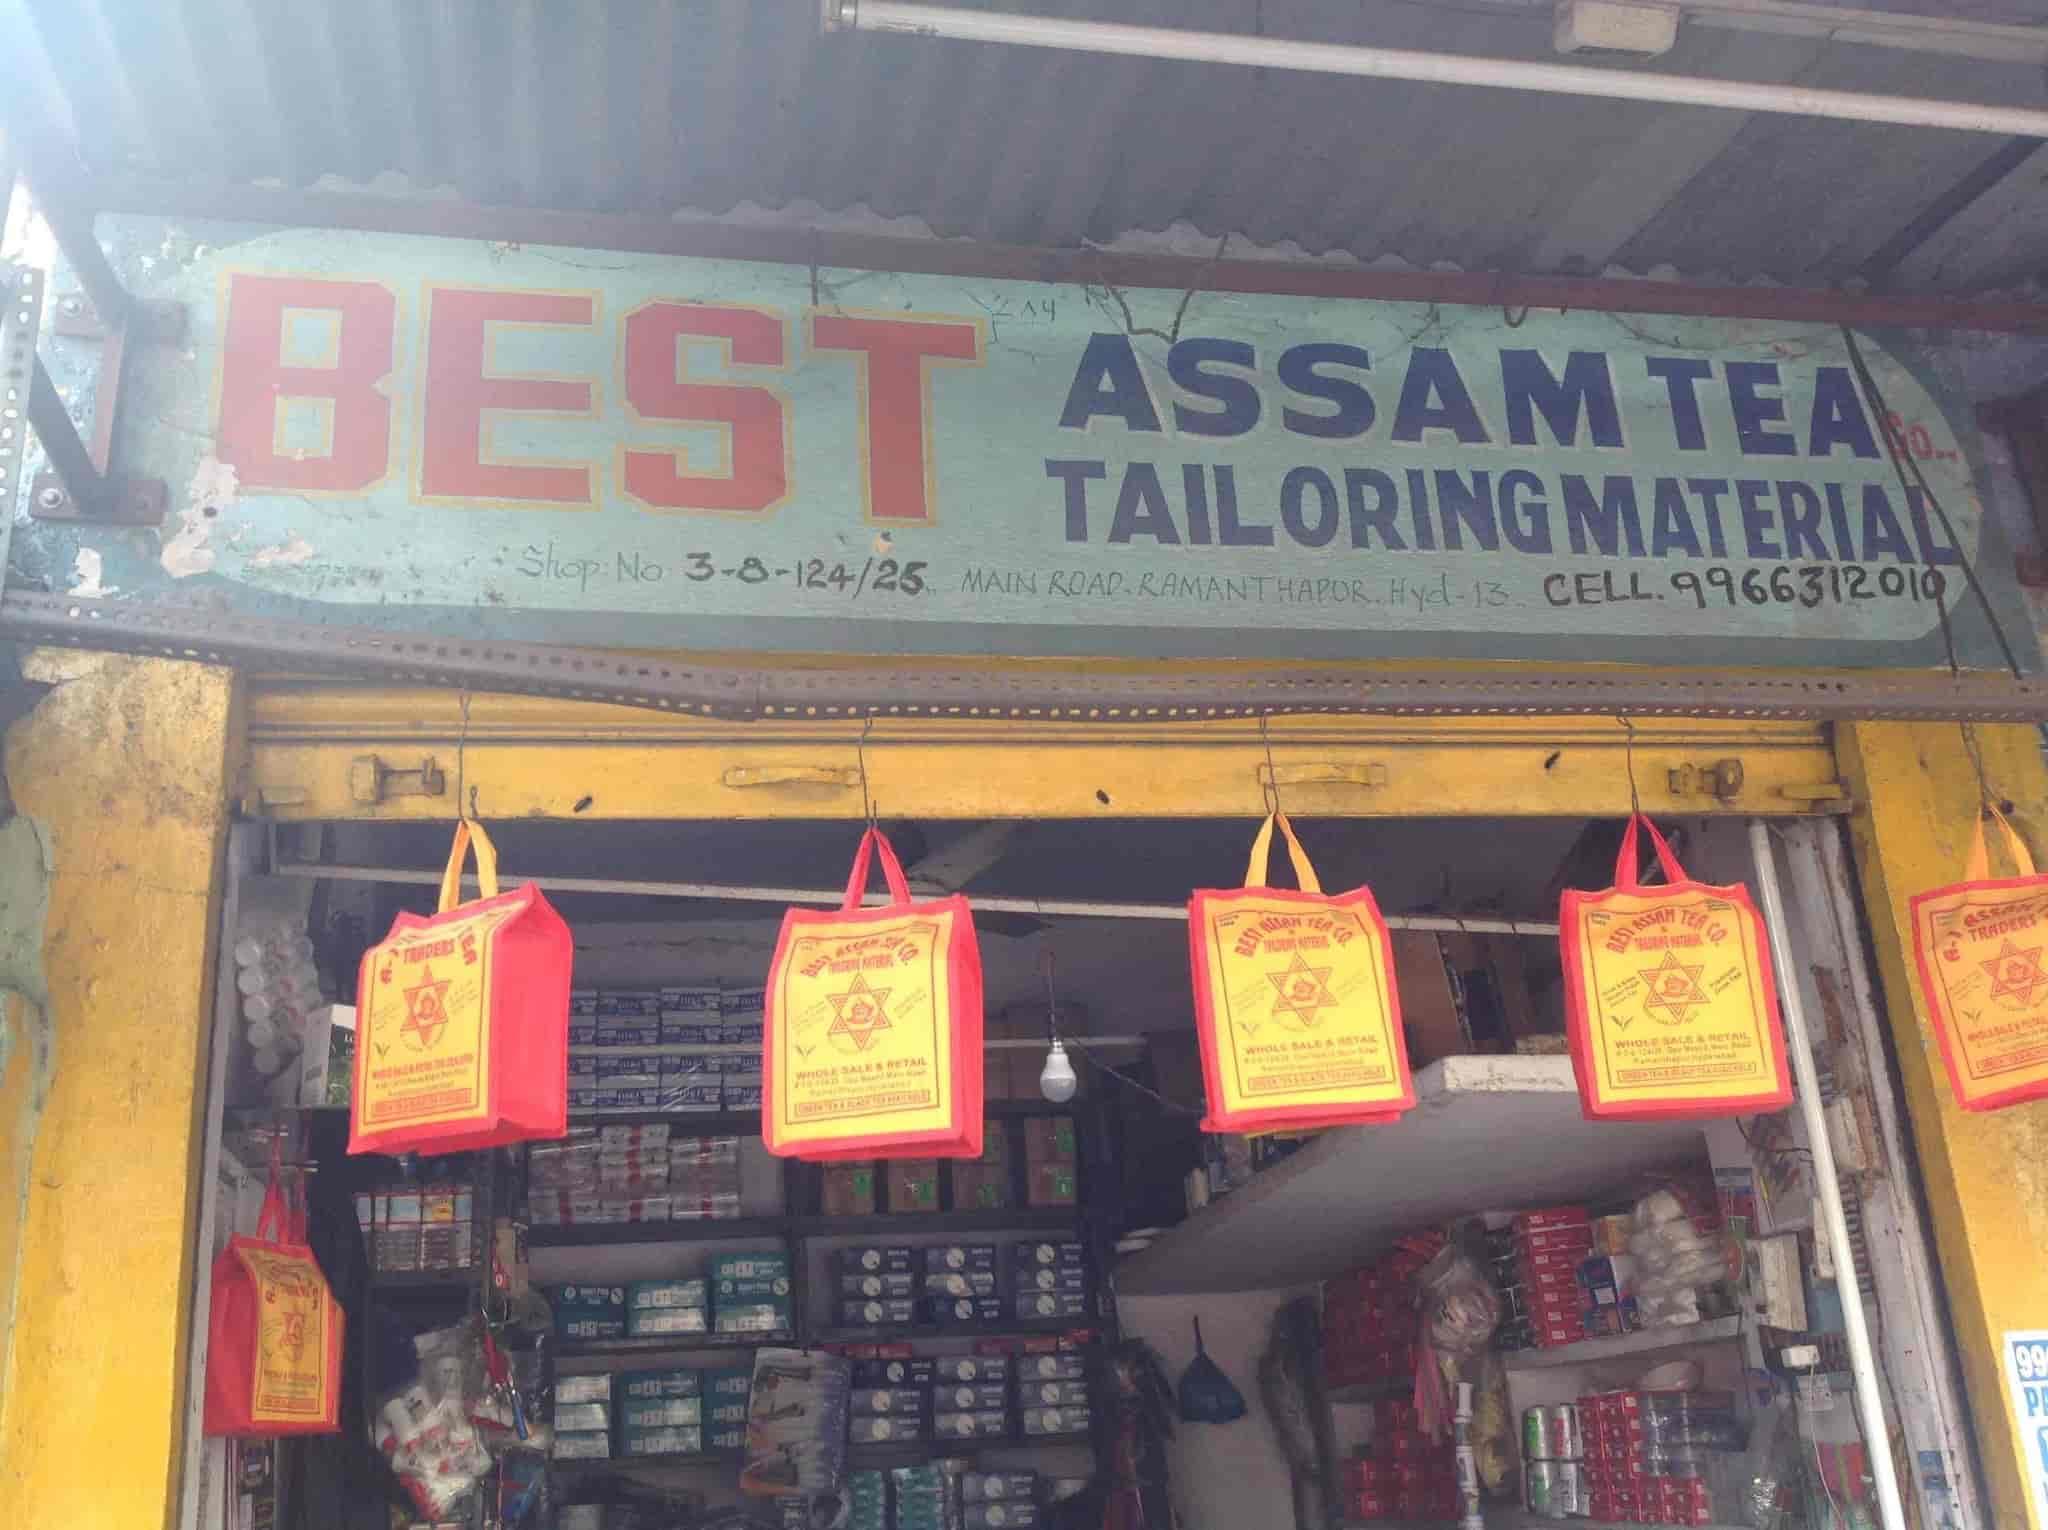 BEST Assam Tea Company Photos, Ramanthapur, Hyderabad